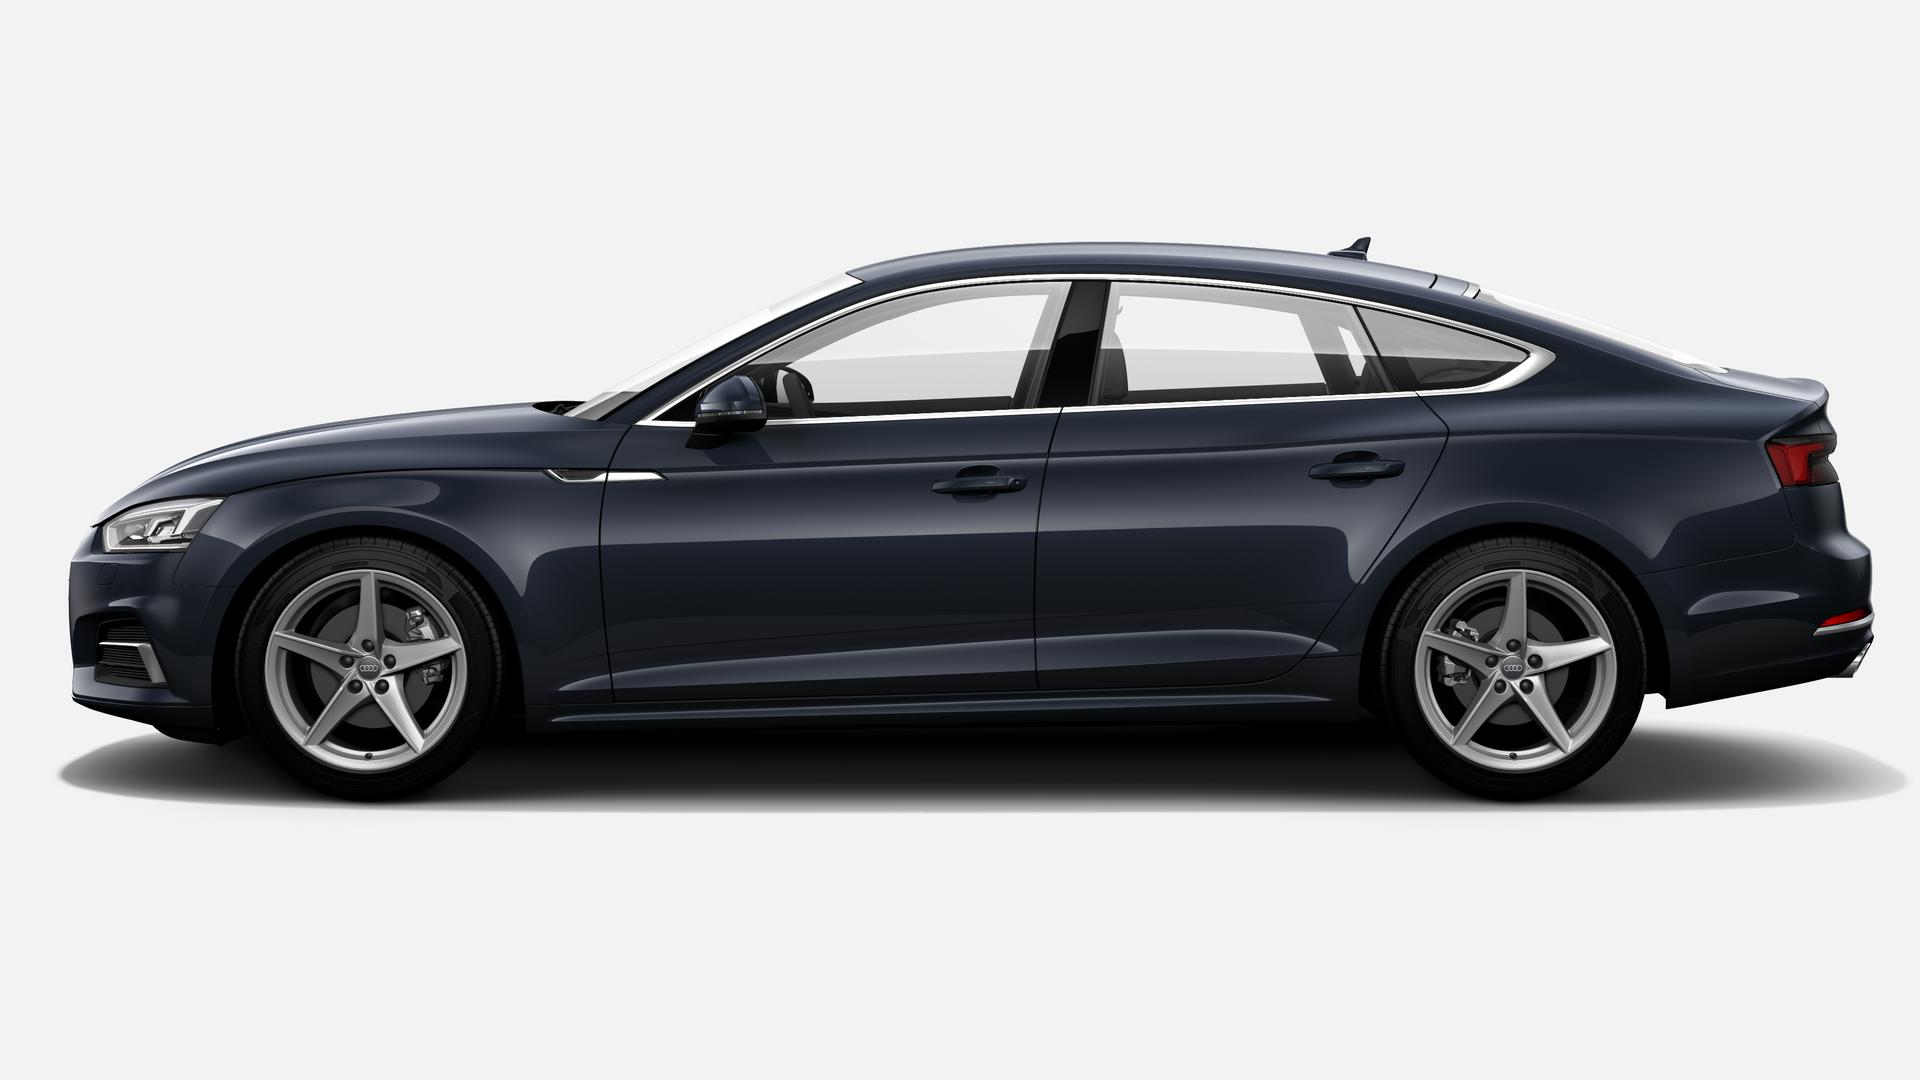 Audi A5 Sportback 2.0 TDI Sport S tronic 110 kW (150 CV)